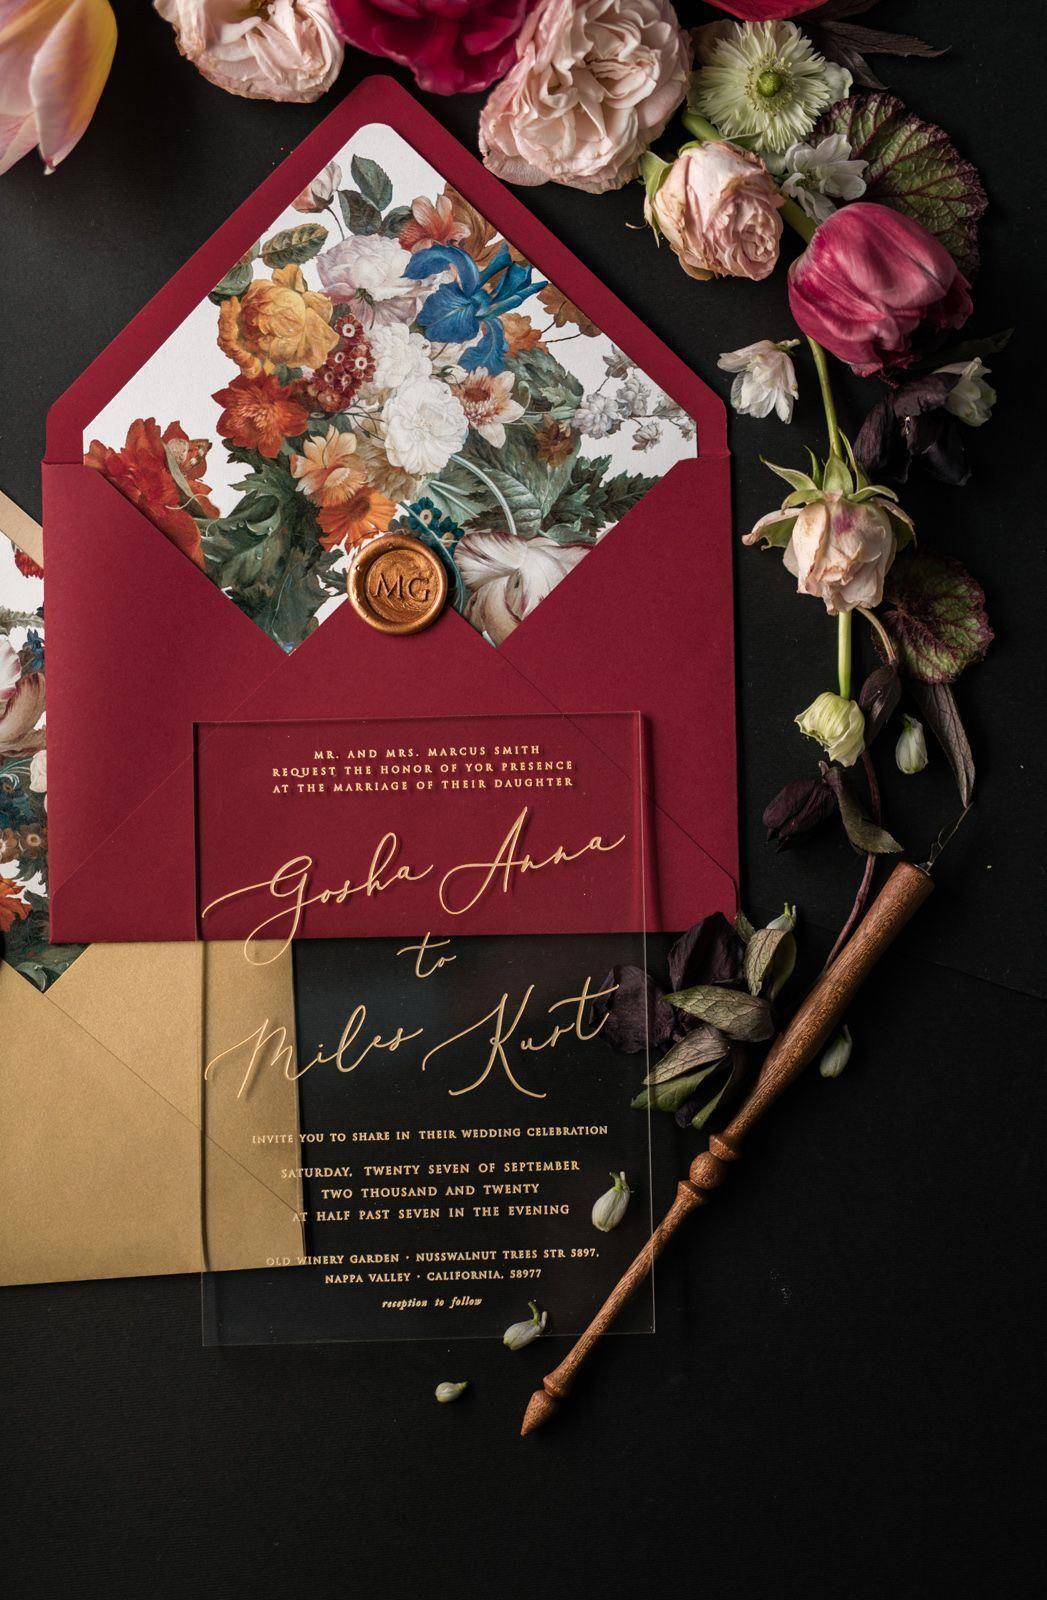 Wedding Invitations 02 Acgn Z Elegantweddinginvitationsluxury